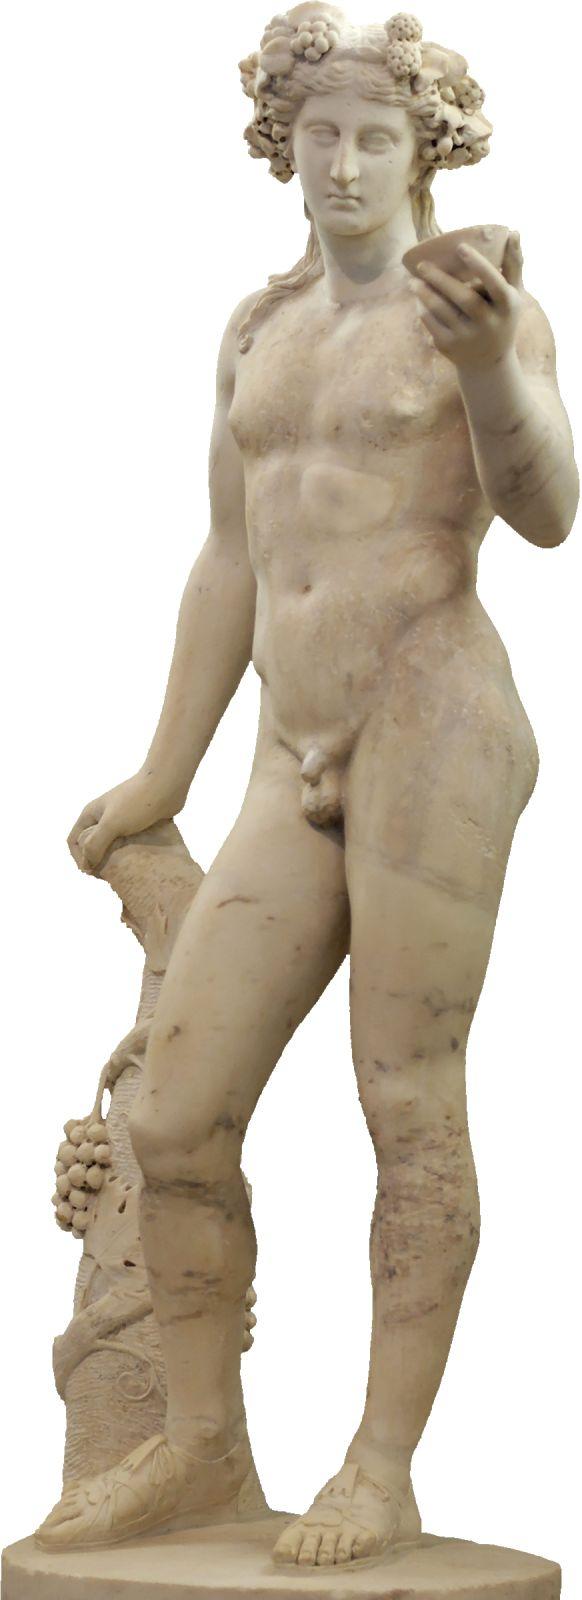 I MIEI SOGNI D'ANARCHIA - Calabria Anarchica: Dioniso/Dionysus